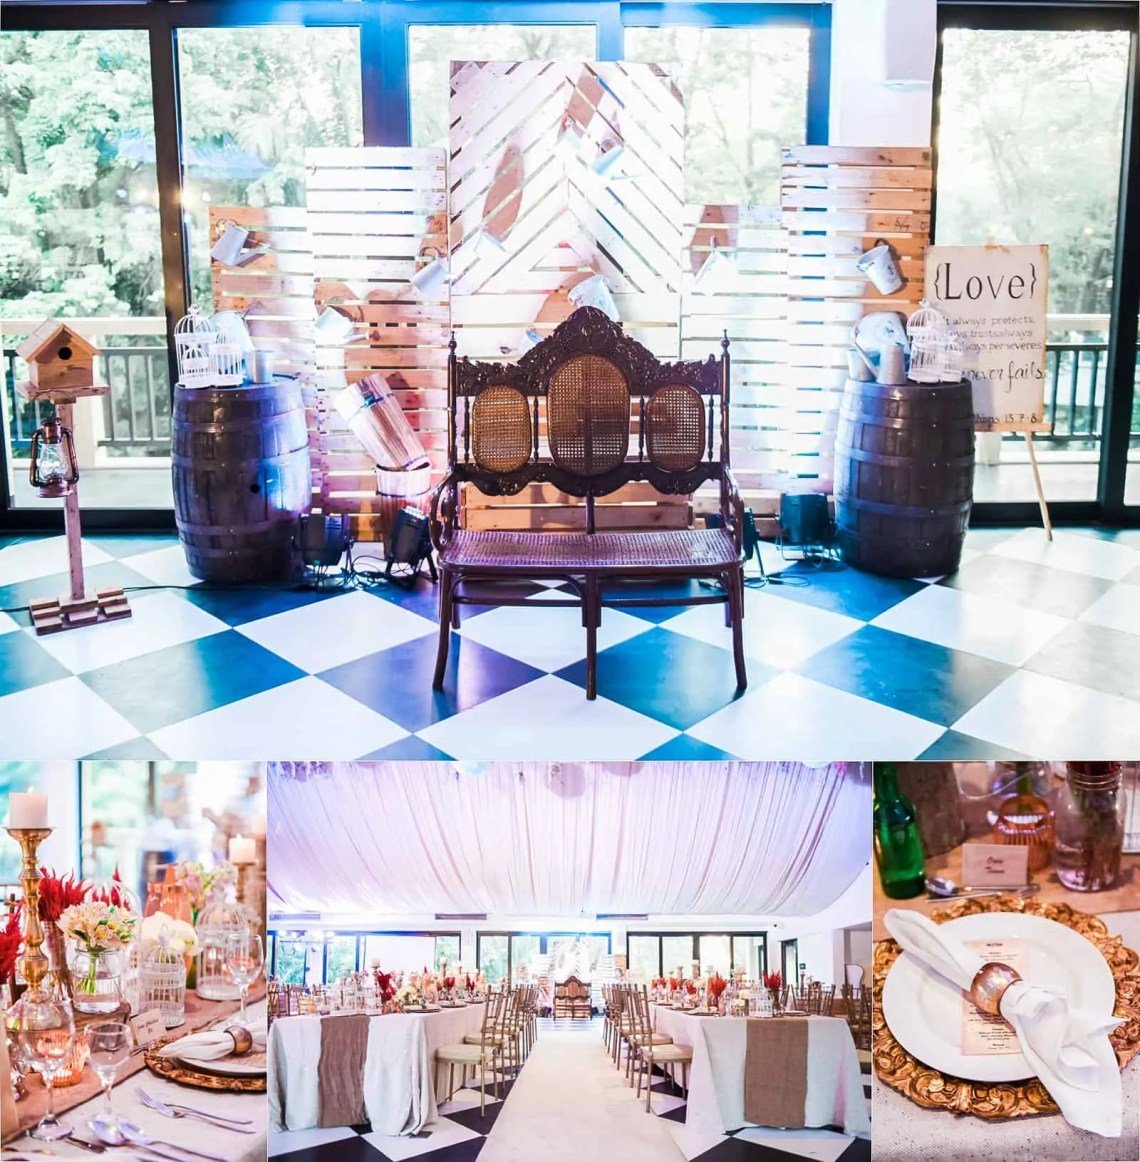 Wedding Reception, Supplier Meals, Feed Wedding Suppliers